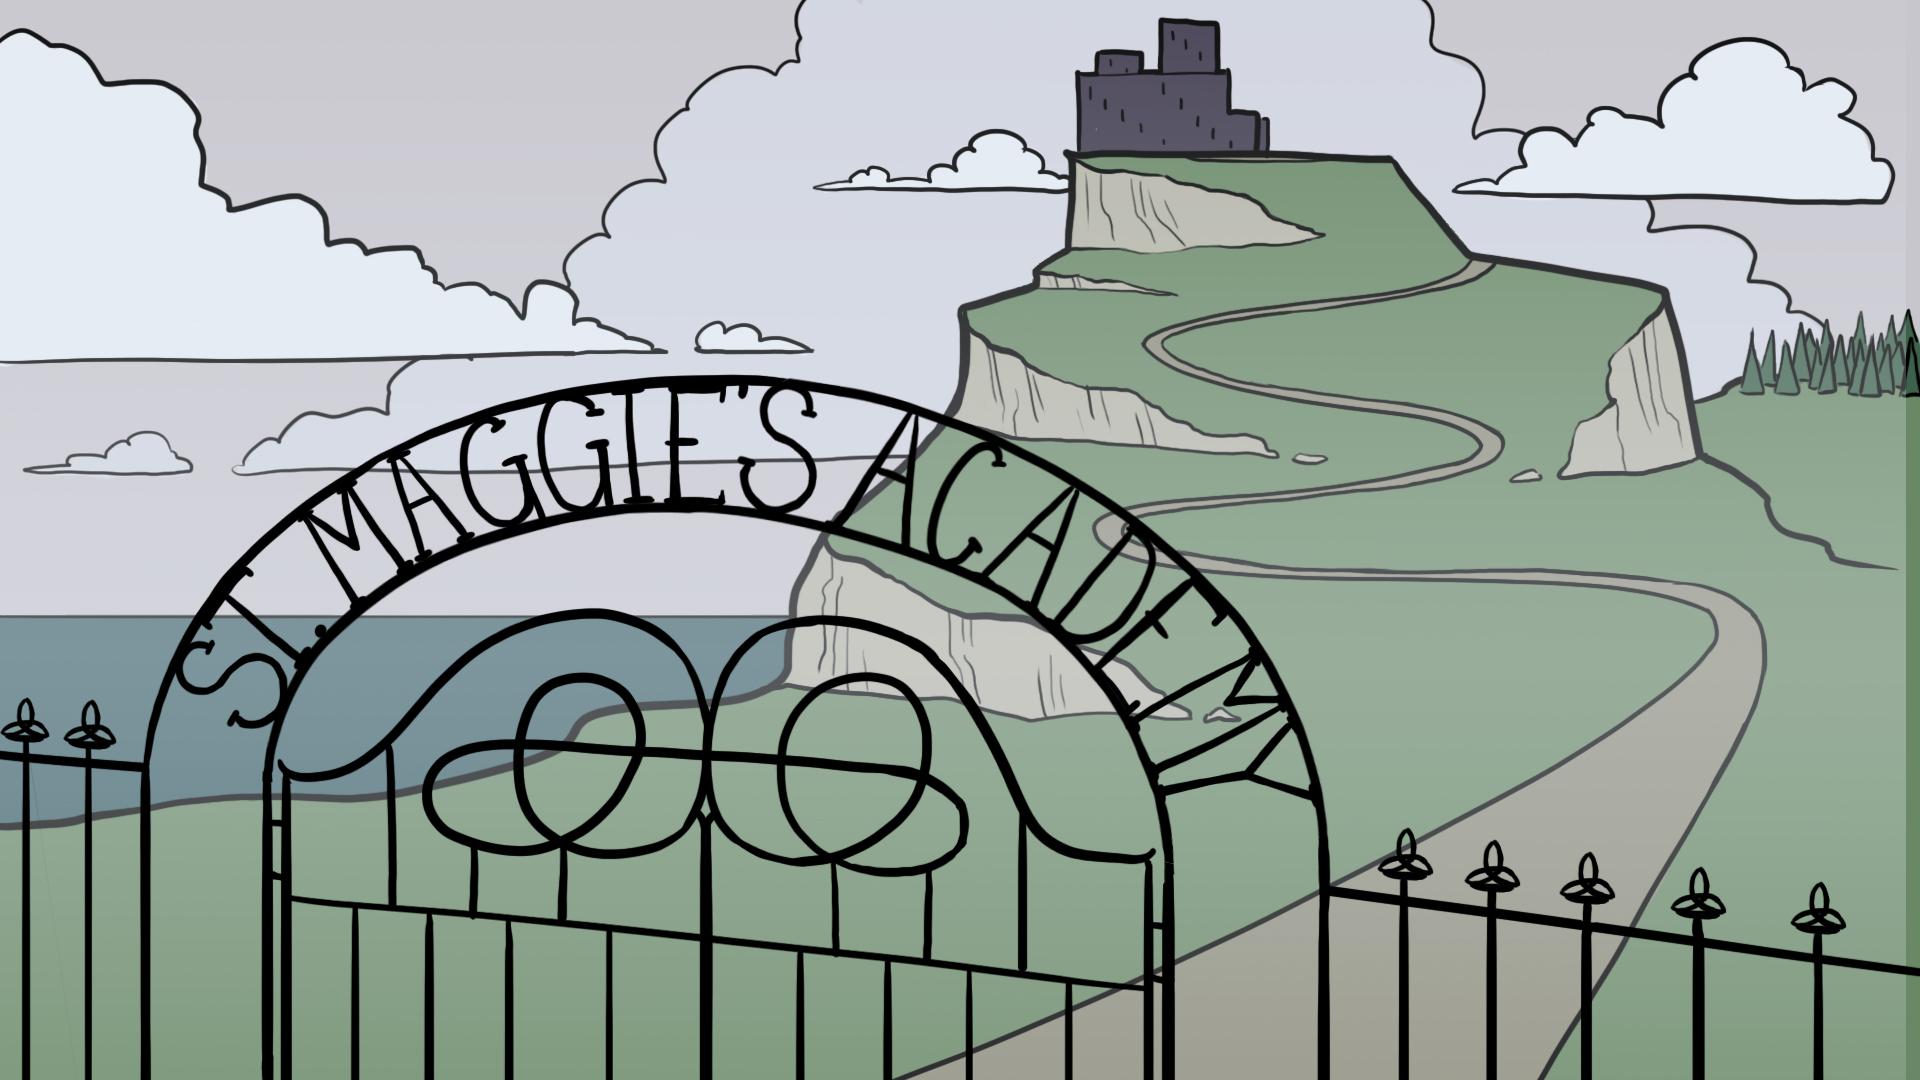 St. Margaret's Academy